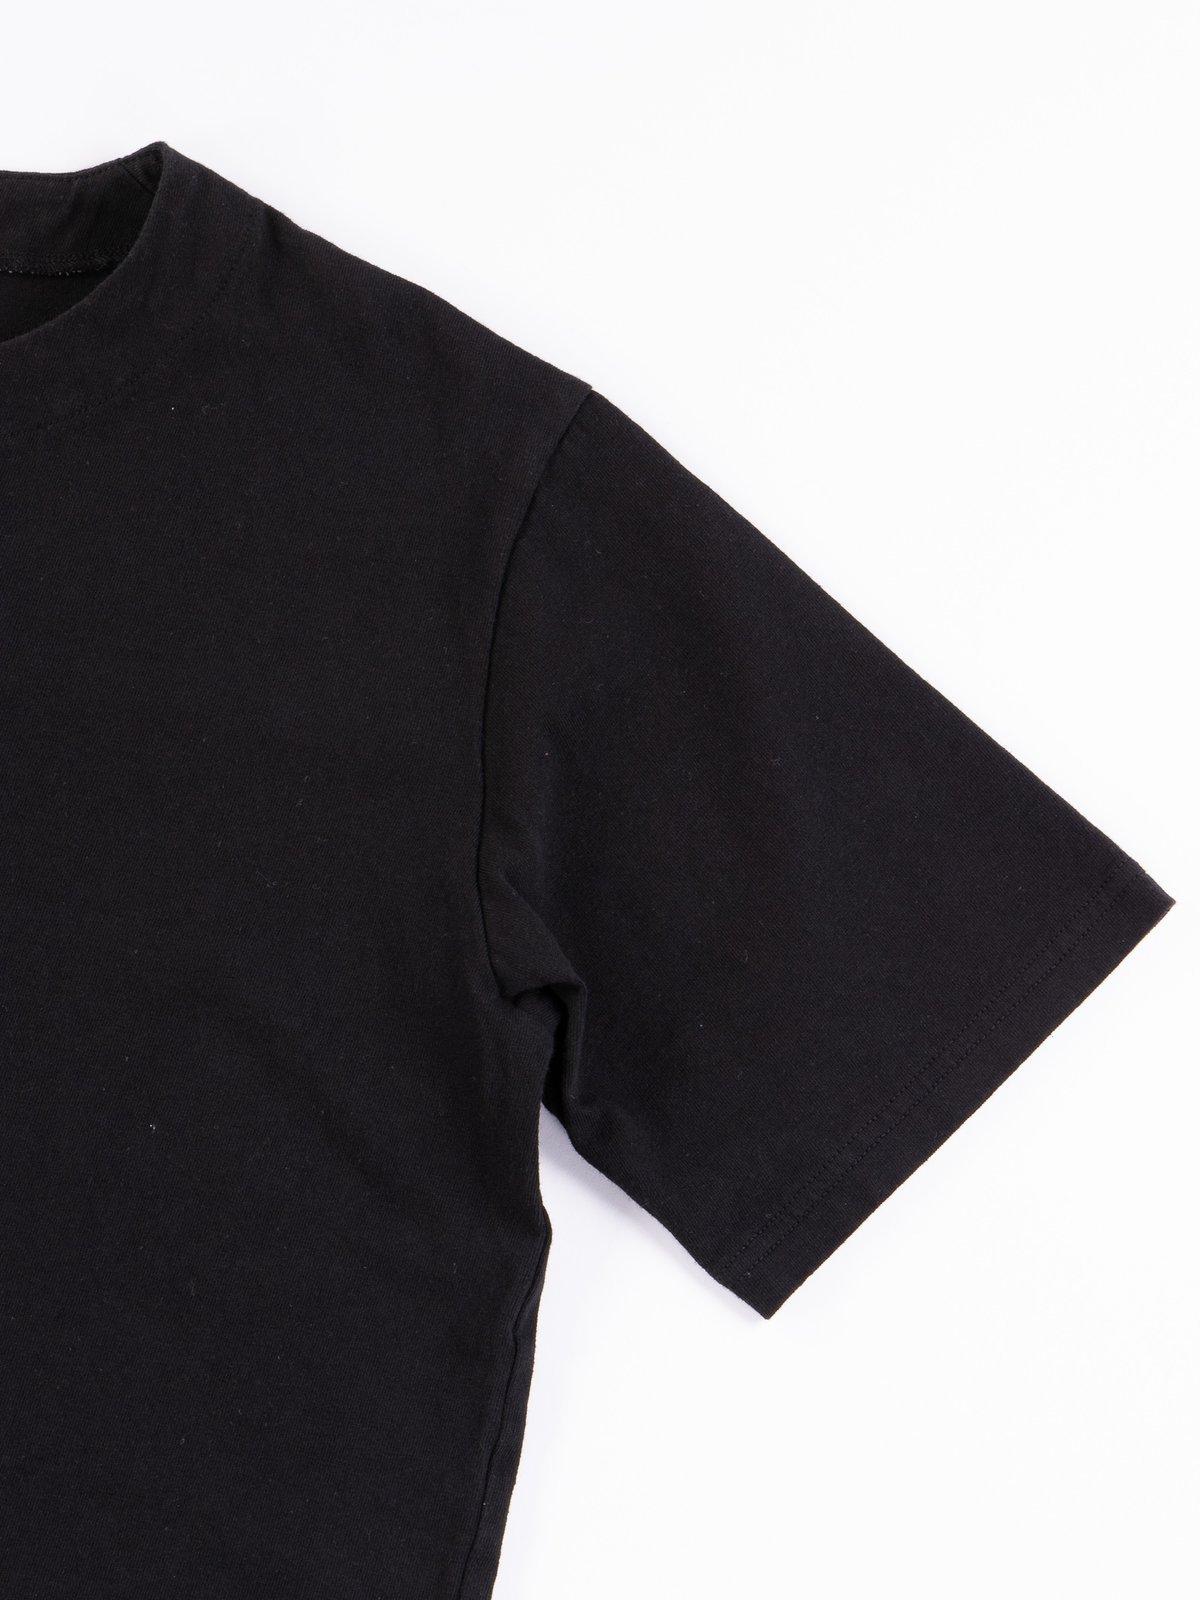 Black Henley T–Shirt - Image 4